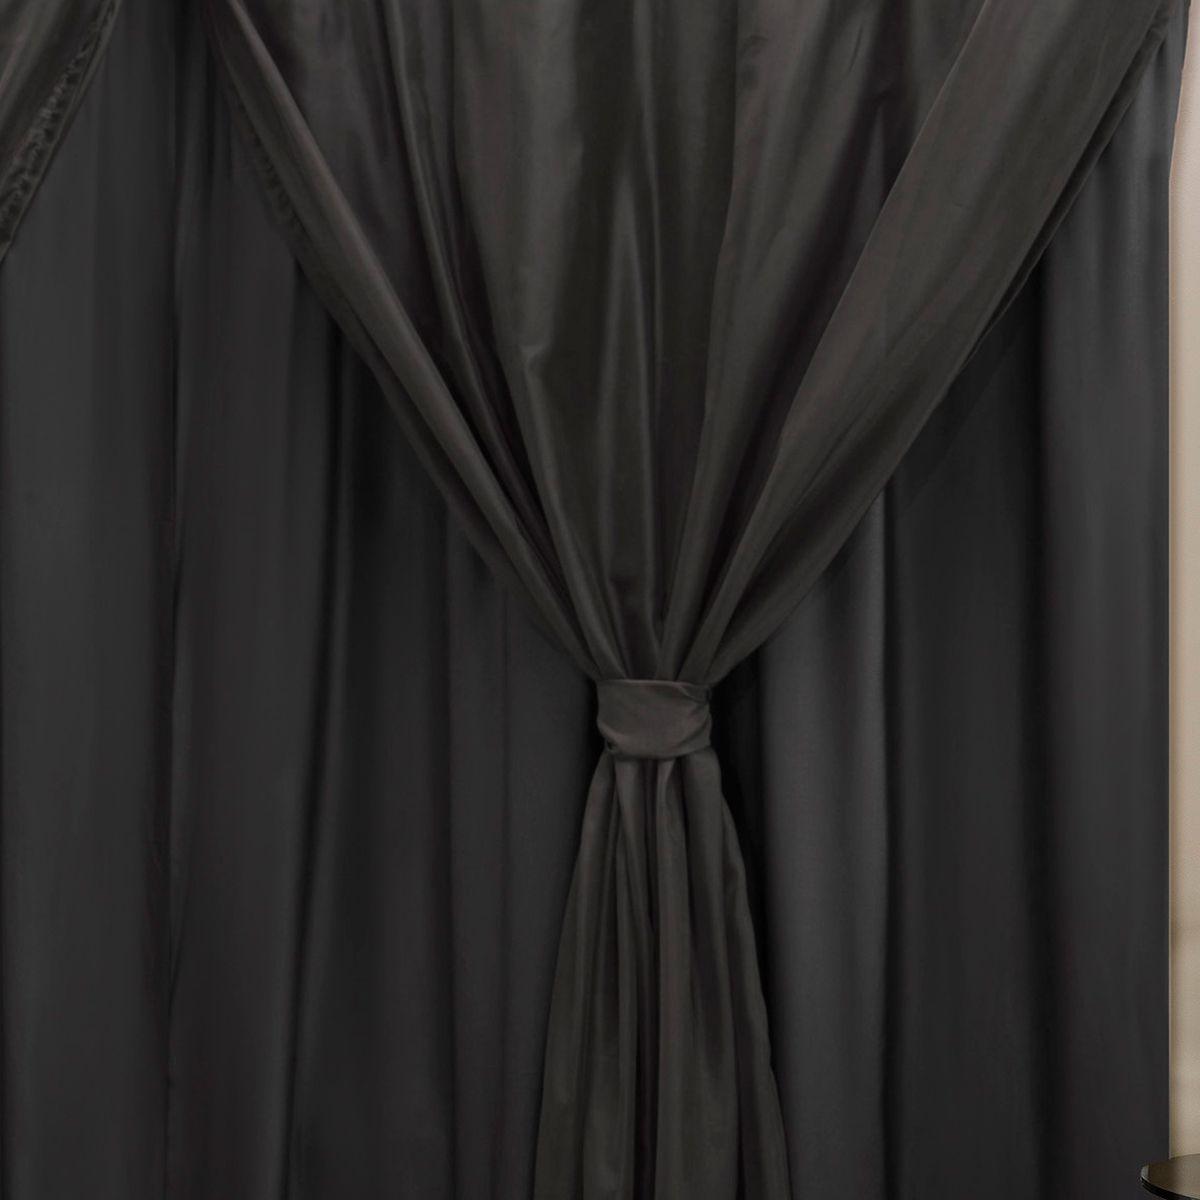 Cortina Blackout PVC c/ Voil Preto Corta Luz 4,20m X 2,50m